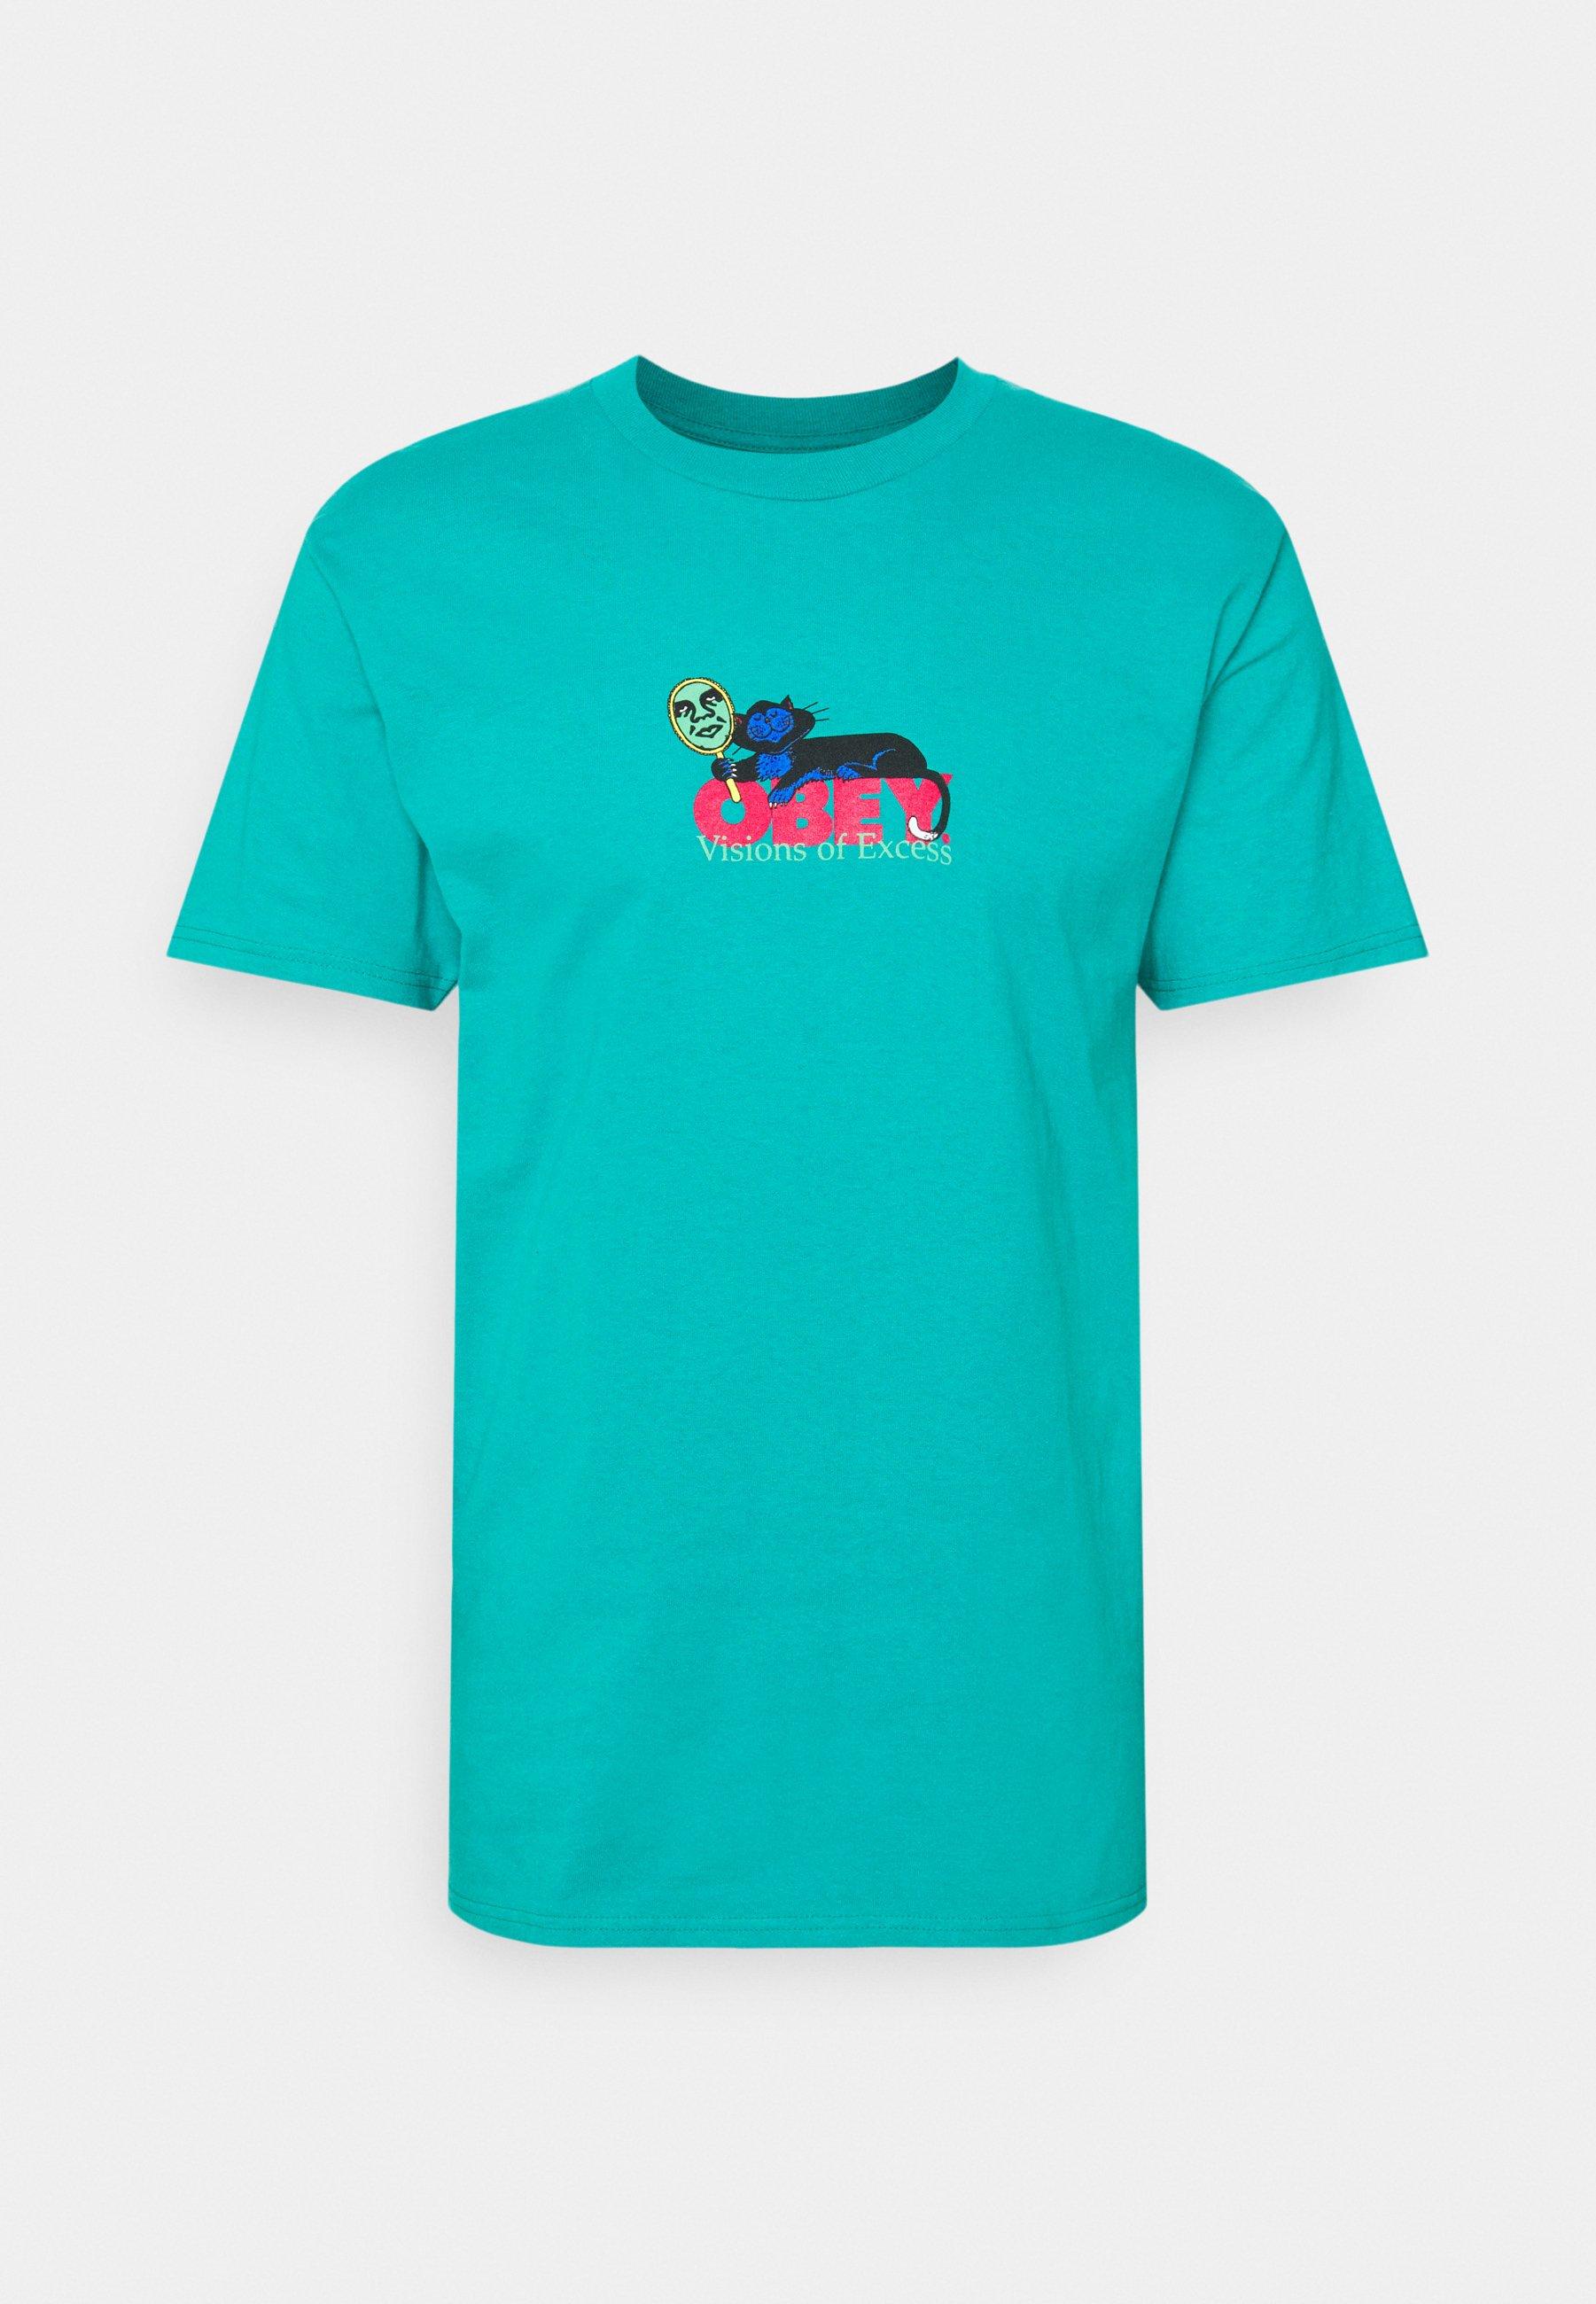 Men VISIONS OF EXCESS - Print T-shirt